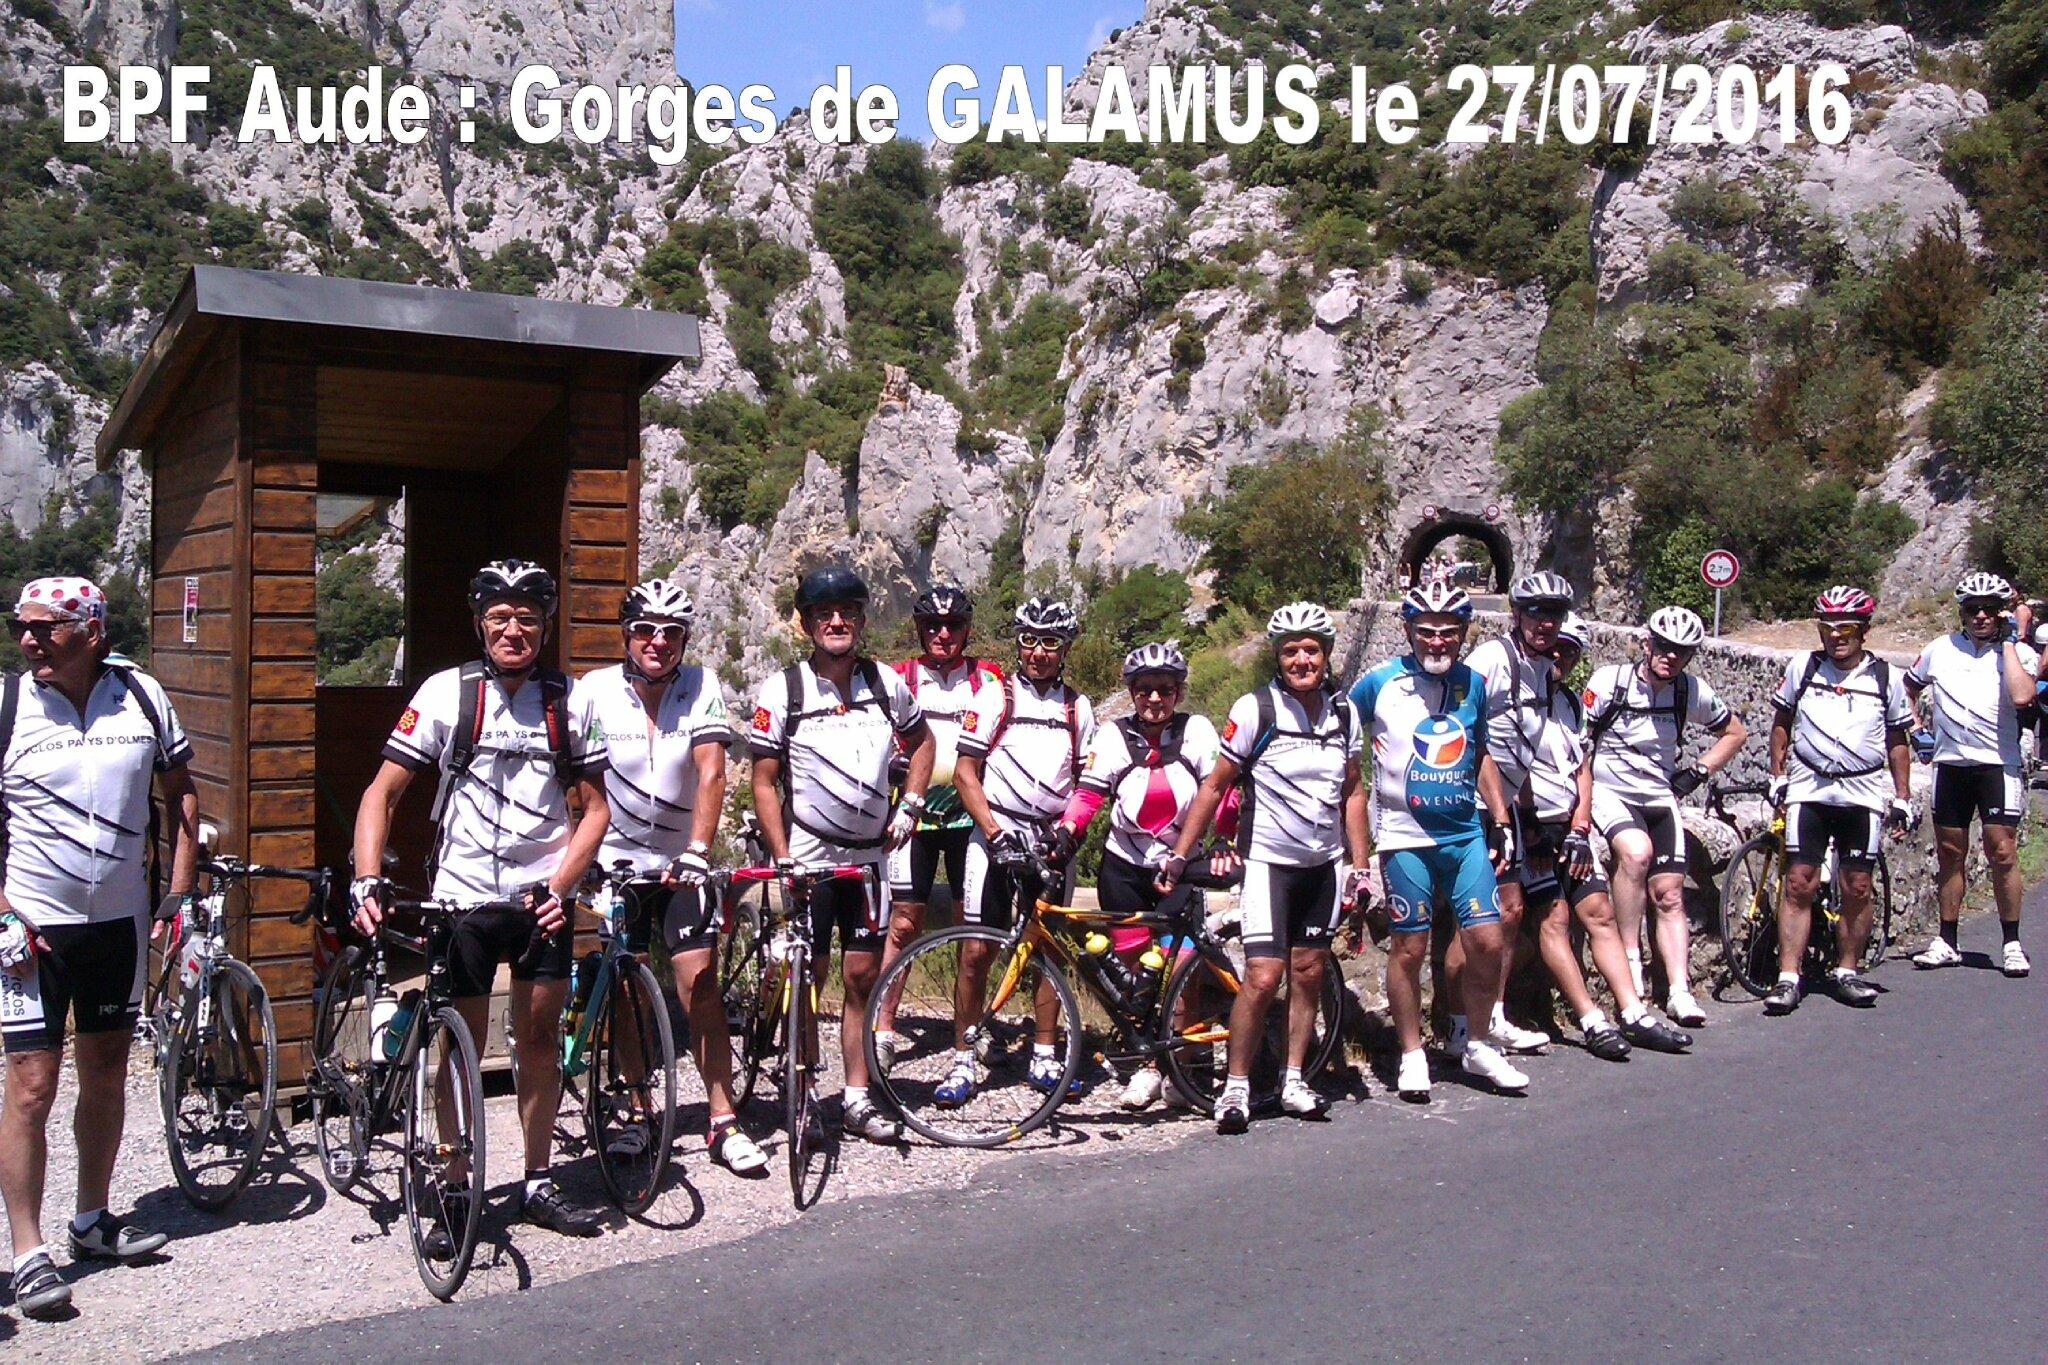 Peyrepertuse- Gorges de Galamus